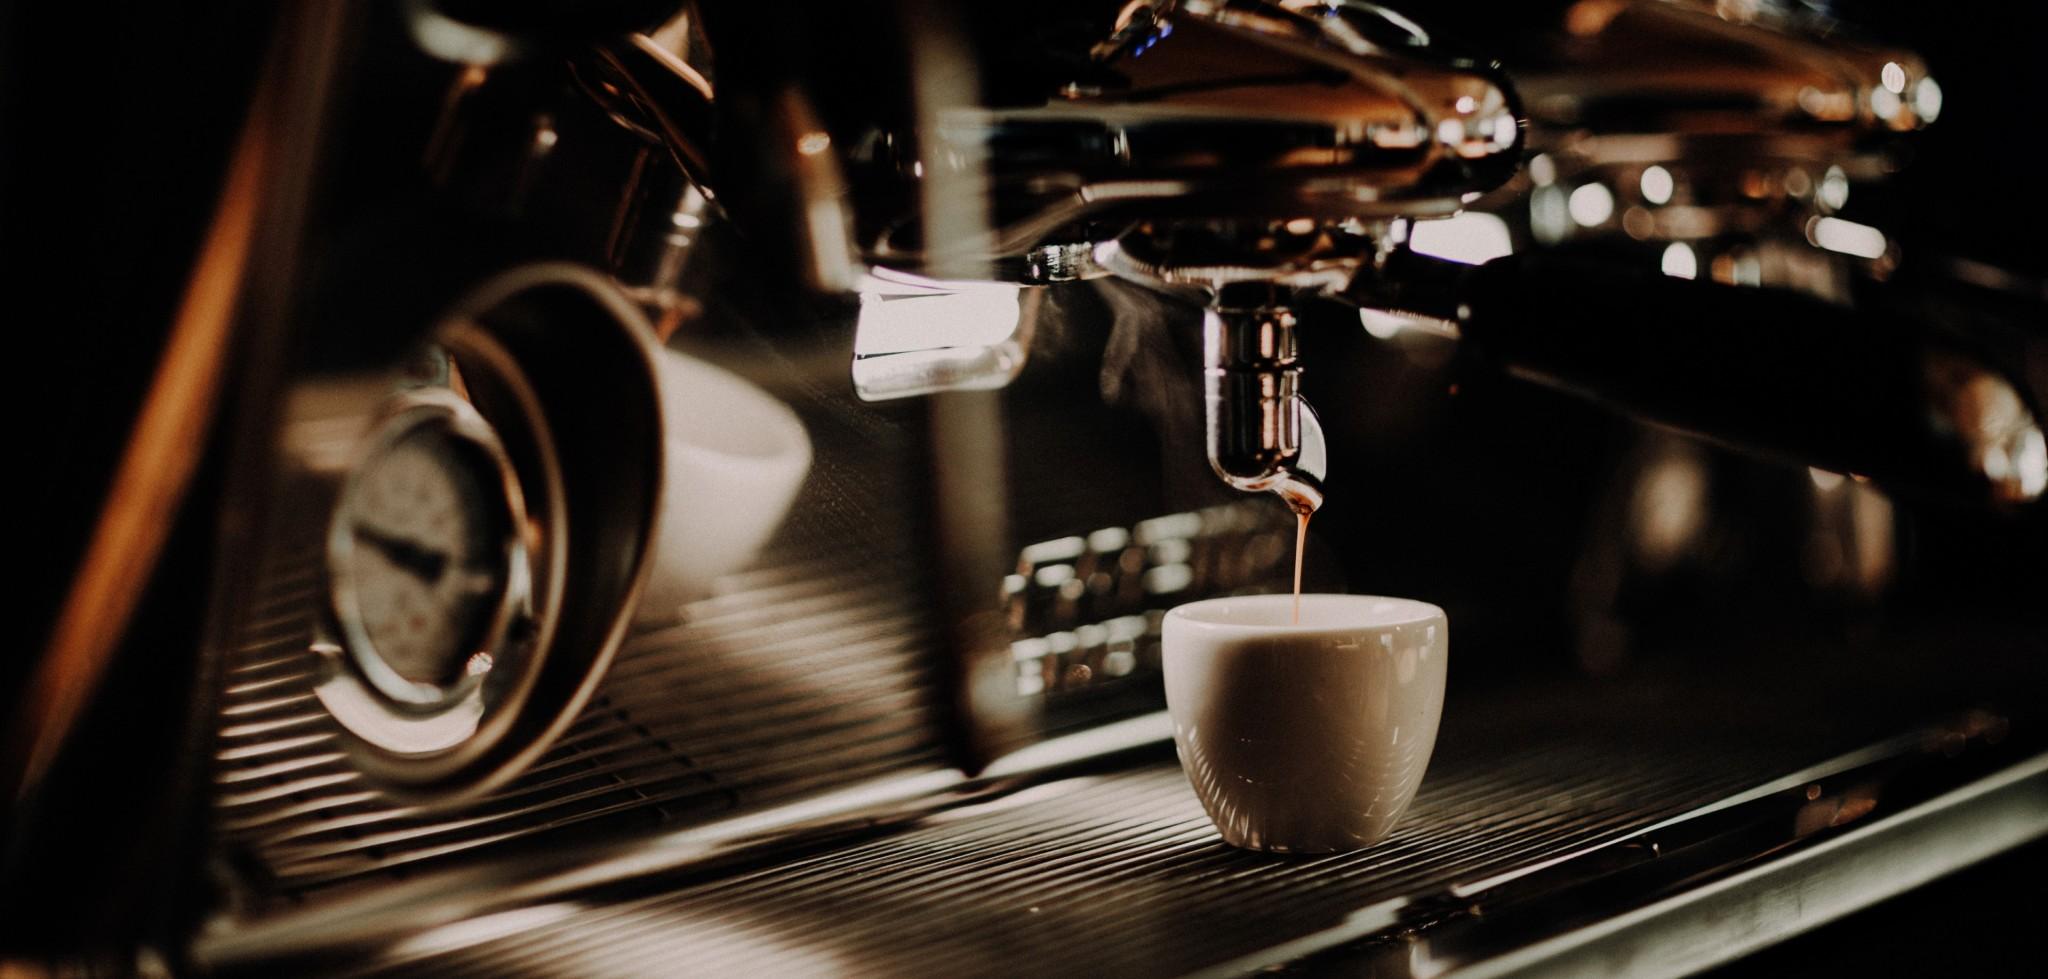 Erlebe Kaffee